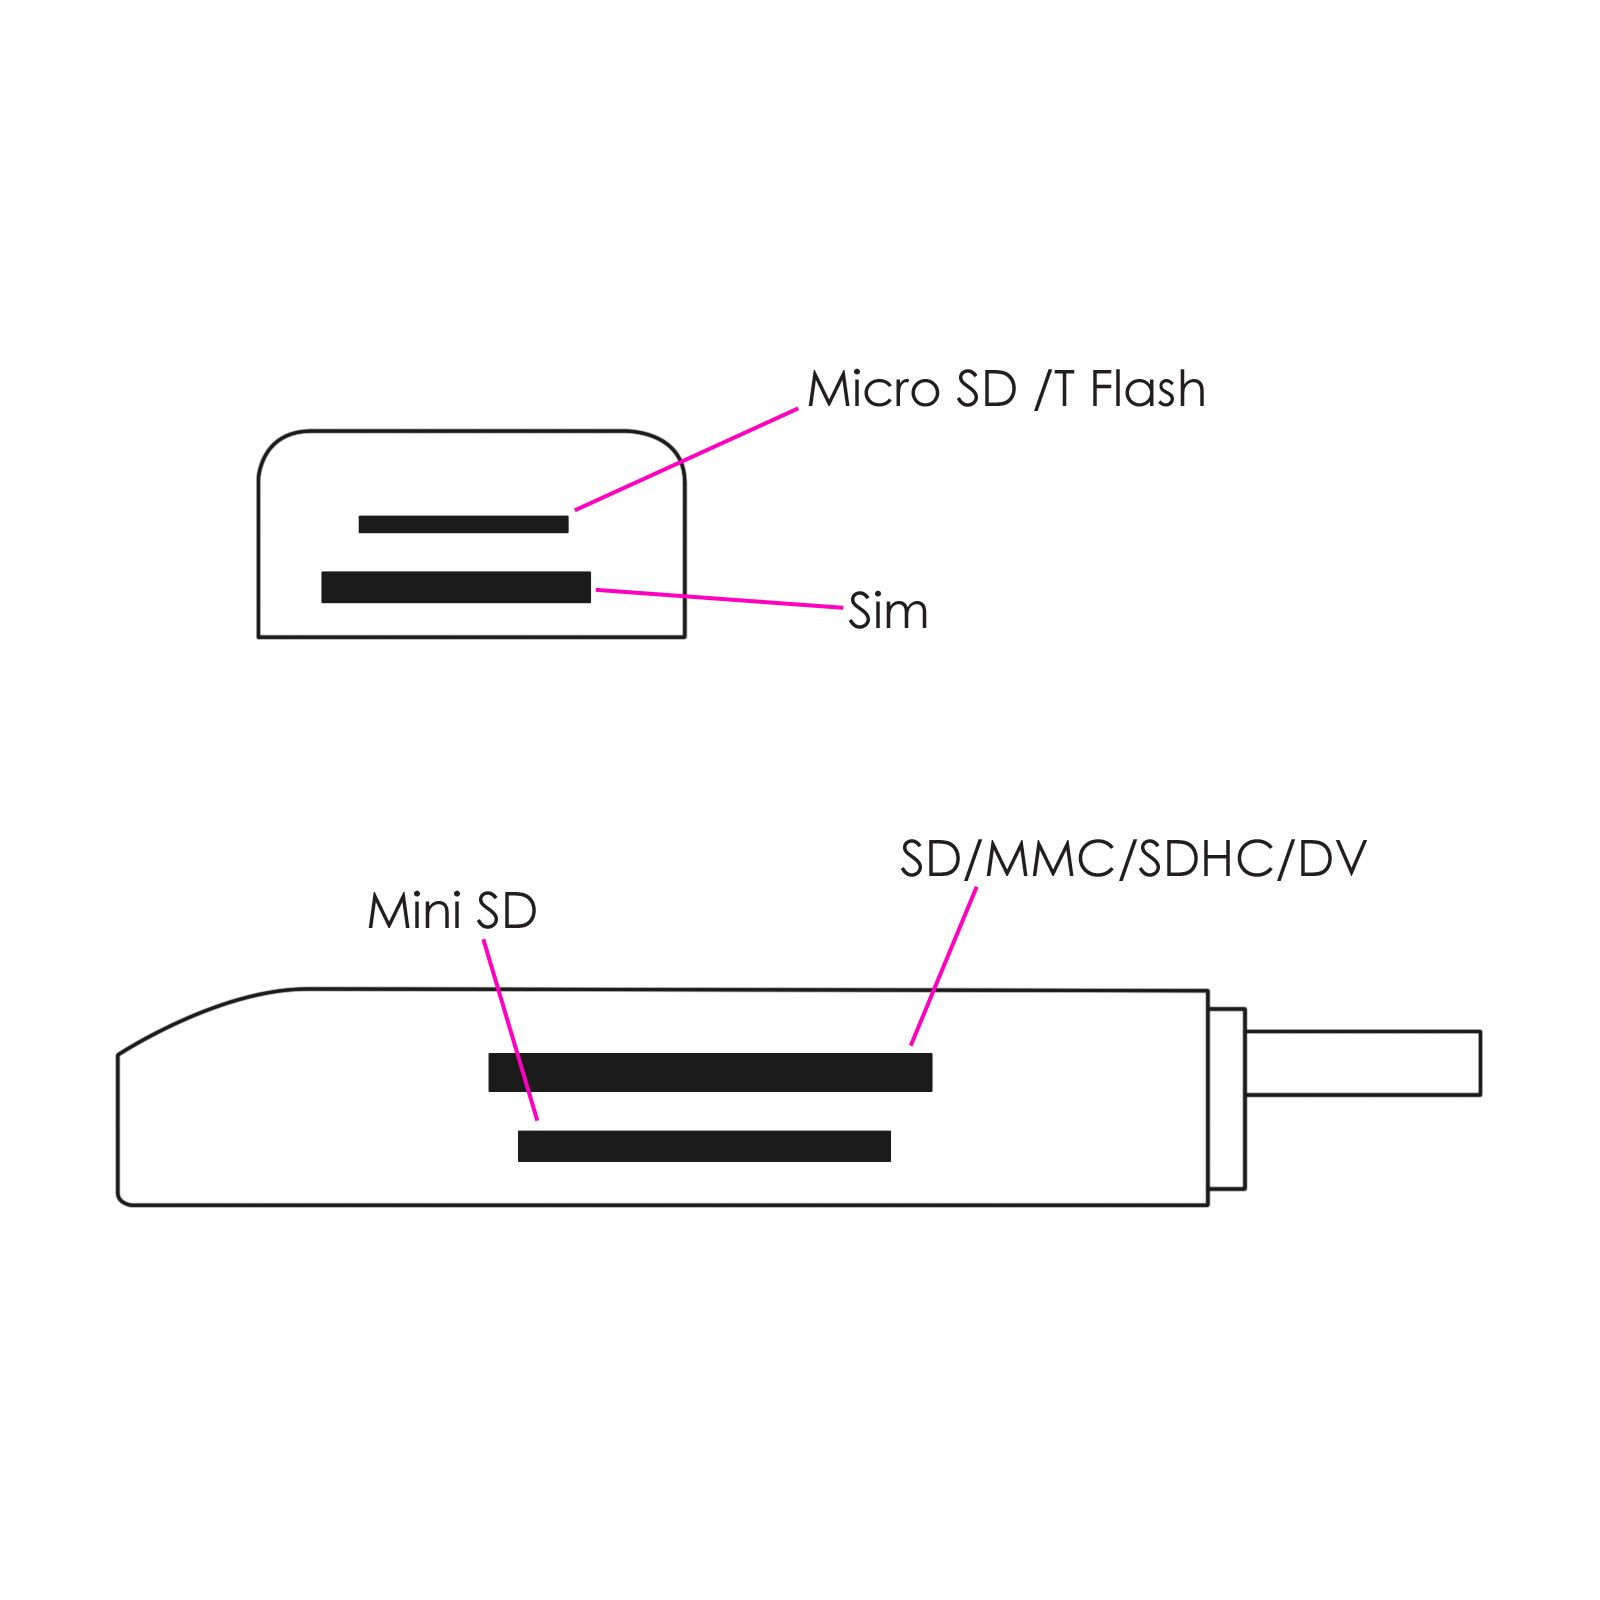 Usb Sim Card Reader Micro Sd Sdhc Mmc Adapter To Pc Sd